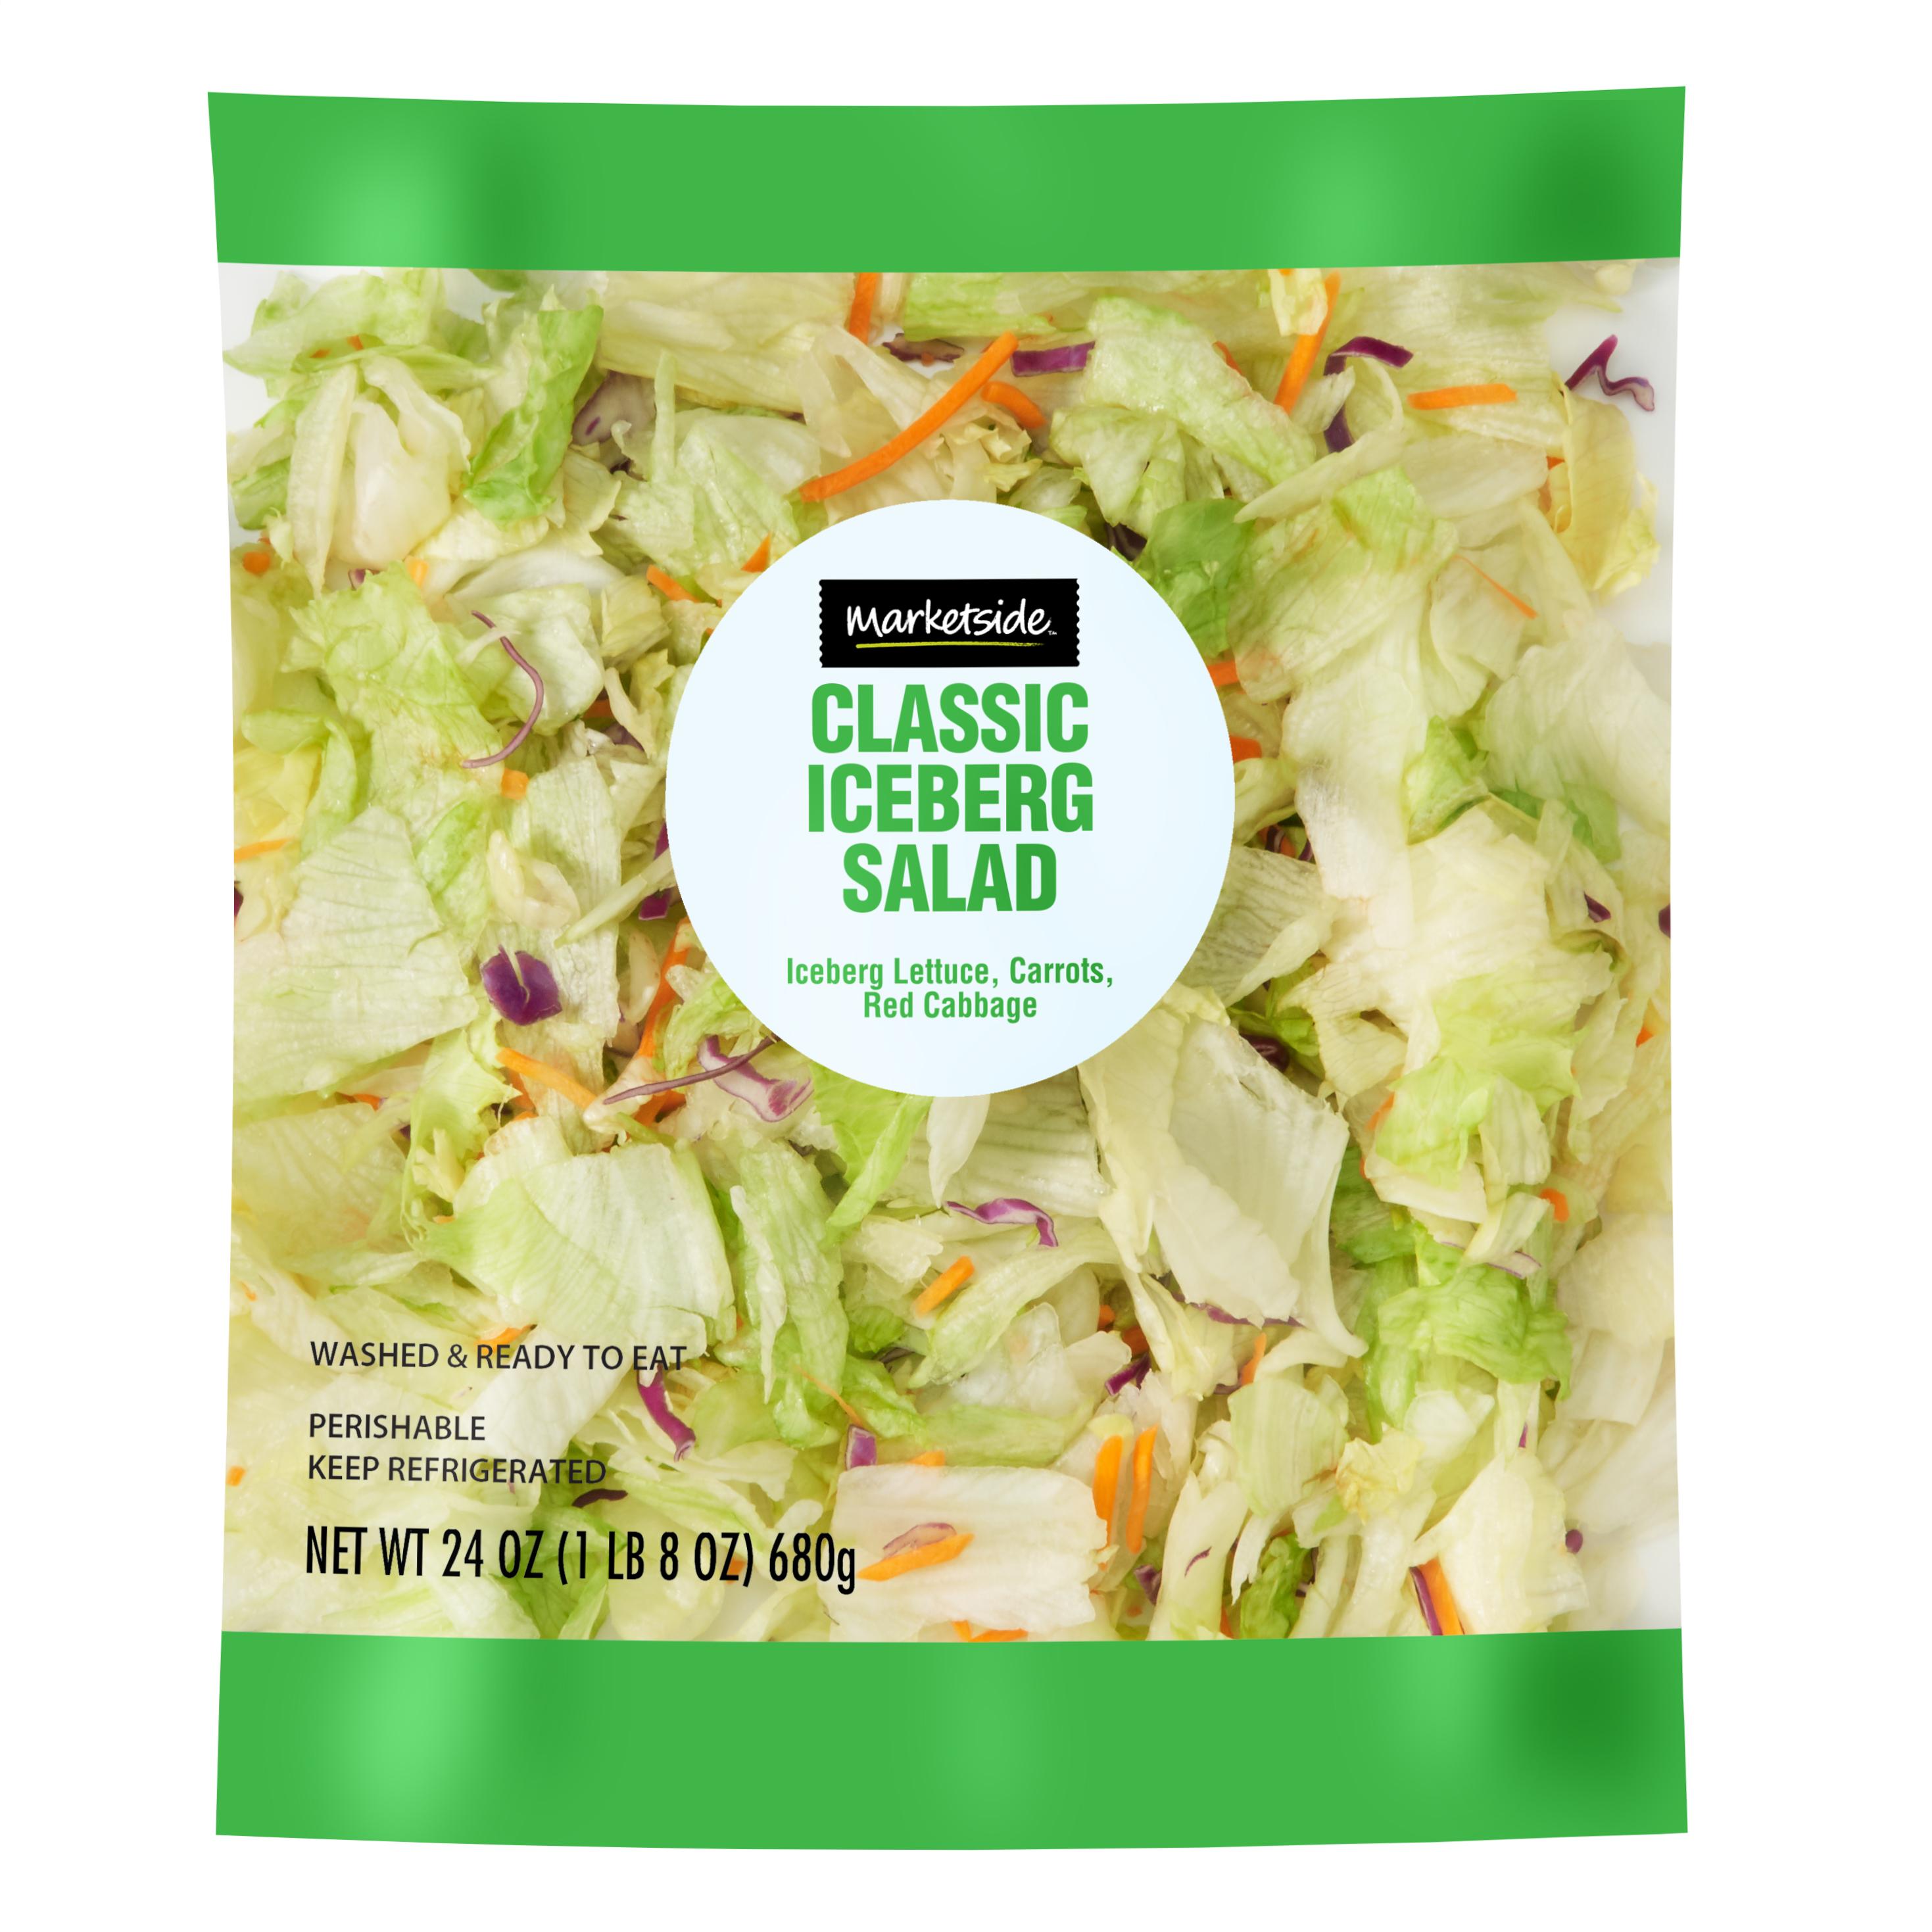 Marketside Classic Iceberg Salad, 24 oz